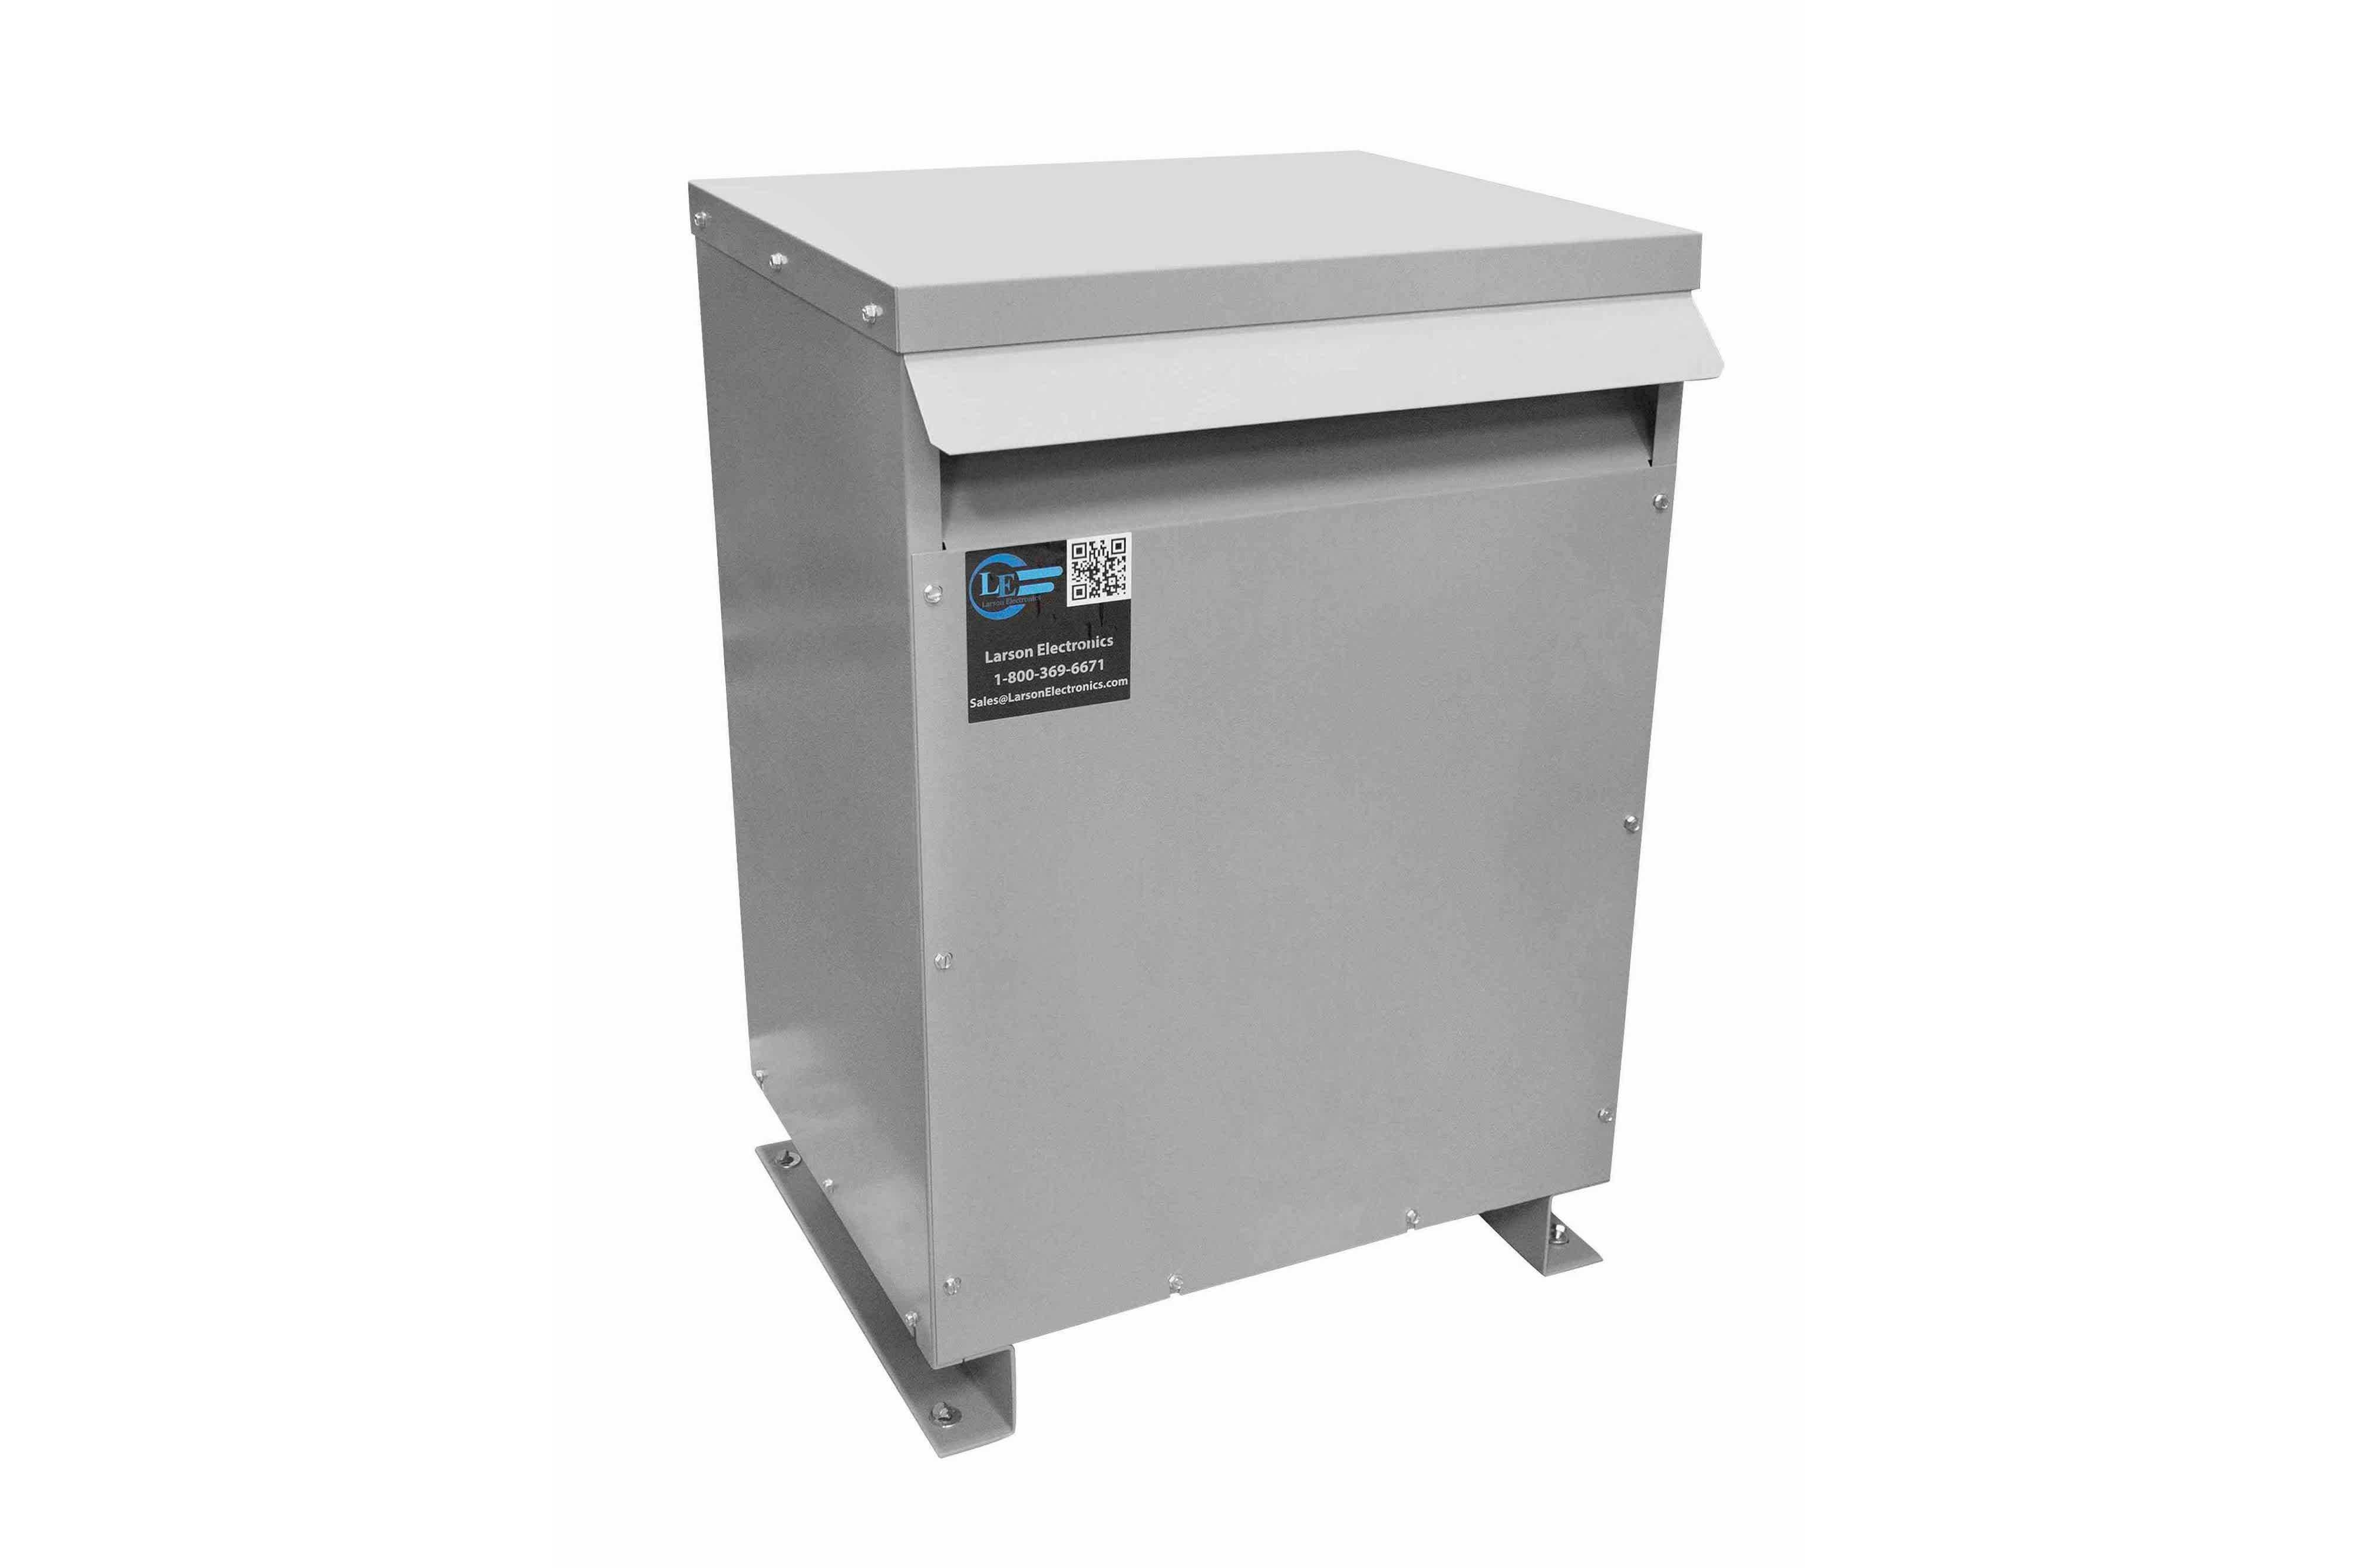 32.5 kVA 3PH Isolation Transformer, 600V Wye Primary, 460V Delta Secondary, N3R, Ventilated, 60 Hz